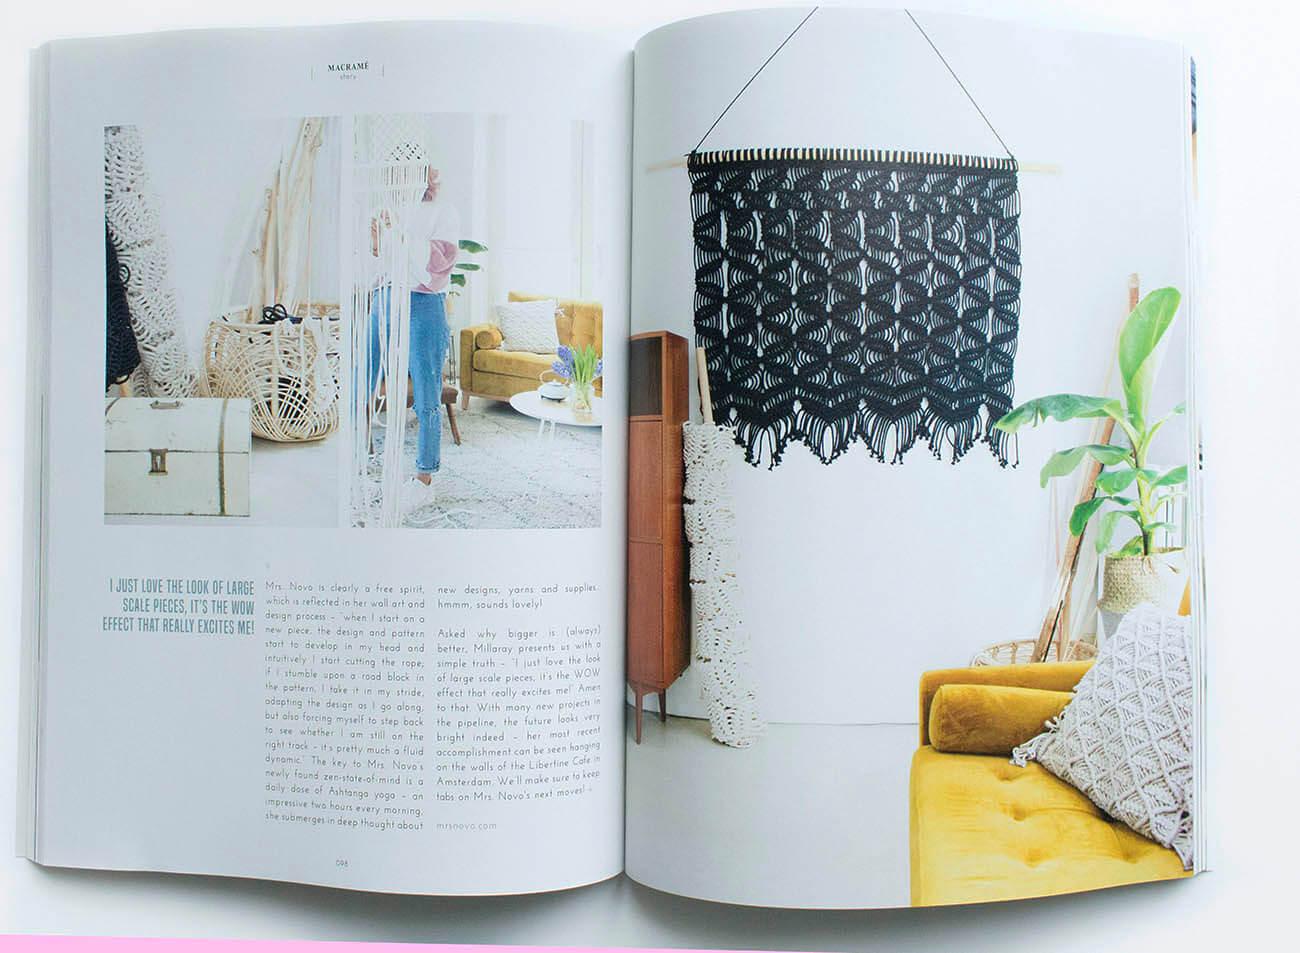 Koel magazine interior article Milla Novo Macrame Wallhanging